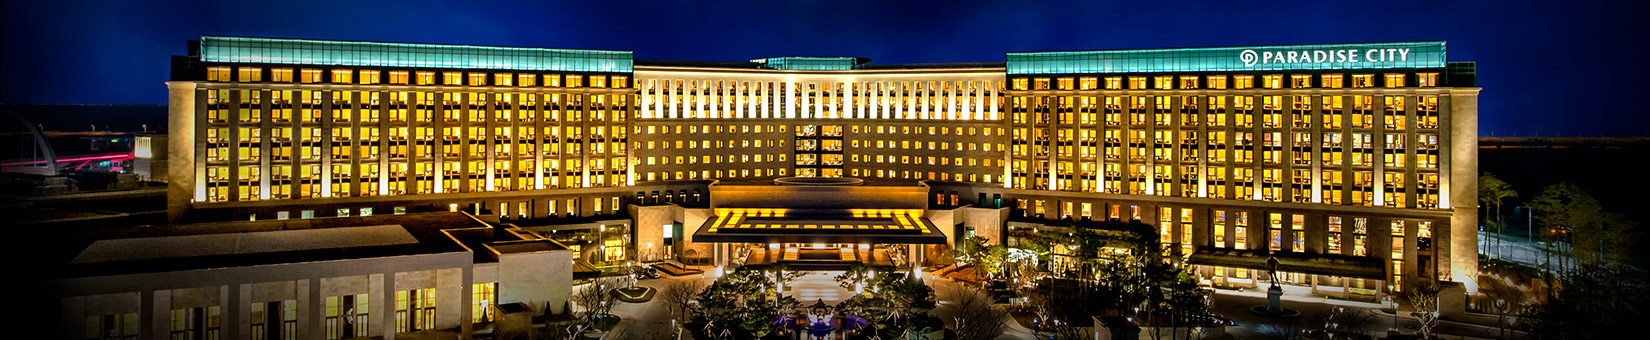 Juego de yumanyi privacidad casino Monte Carlo - 34581